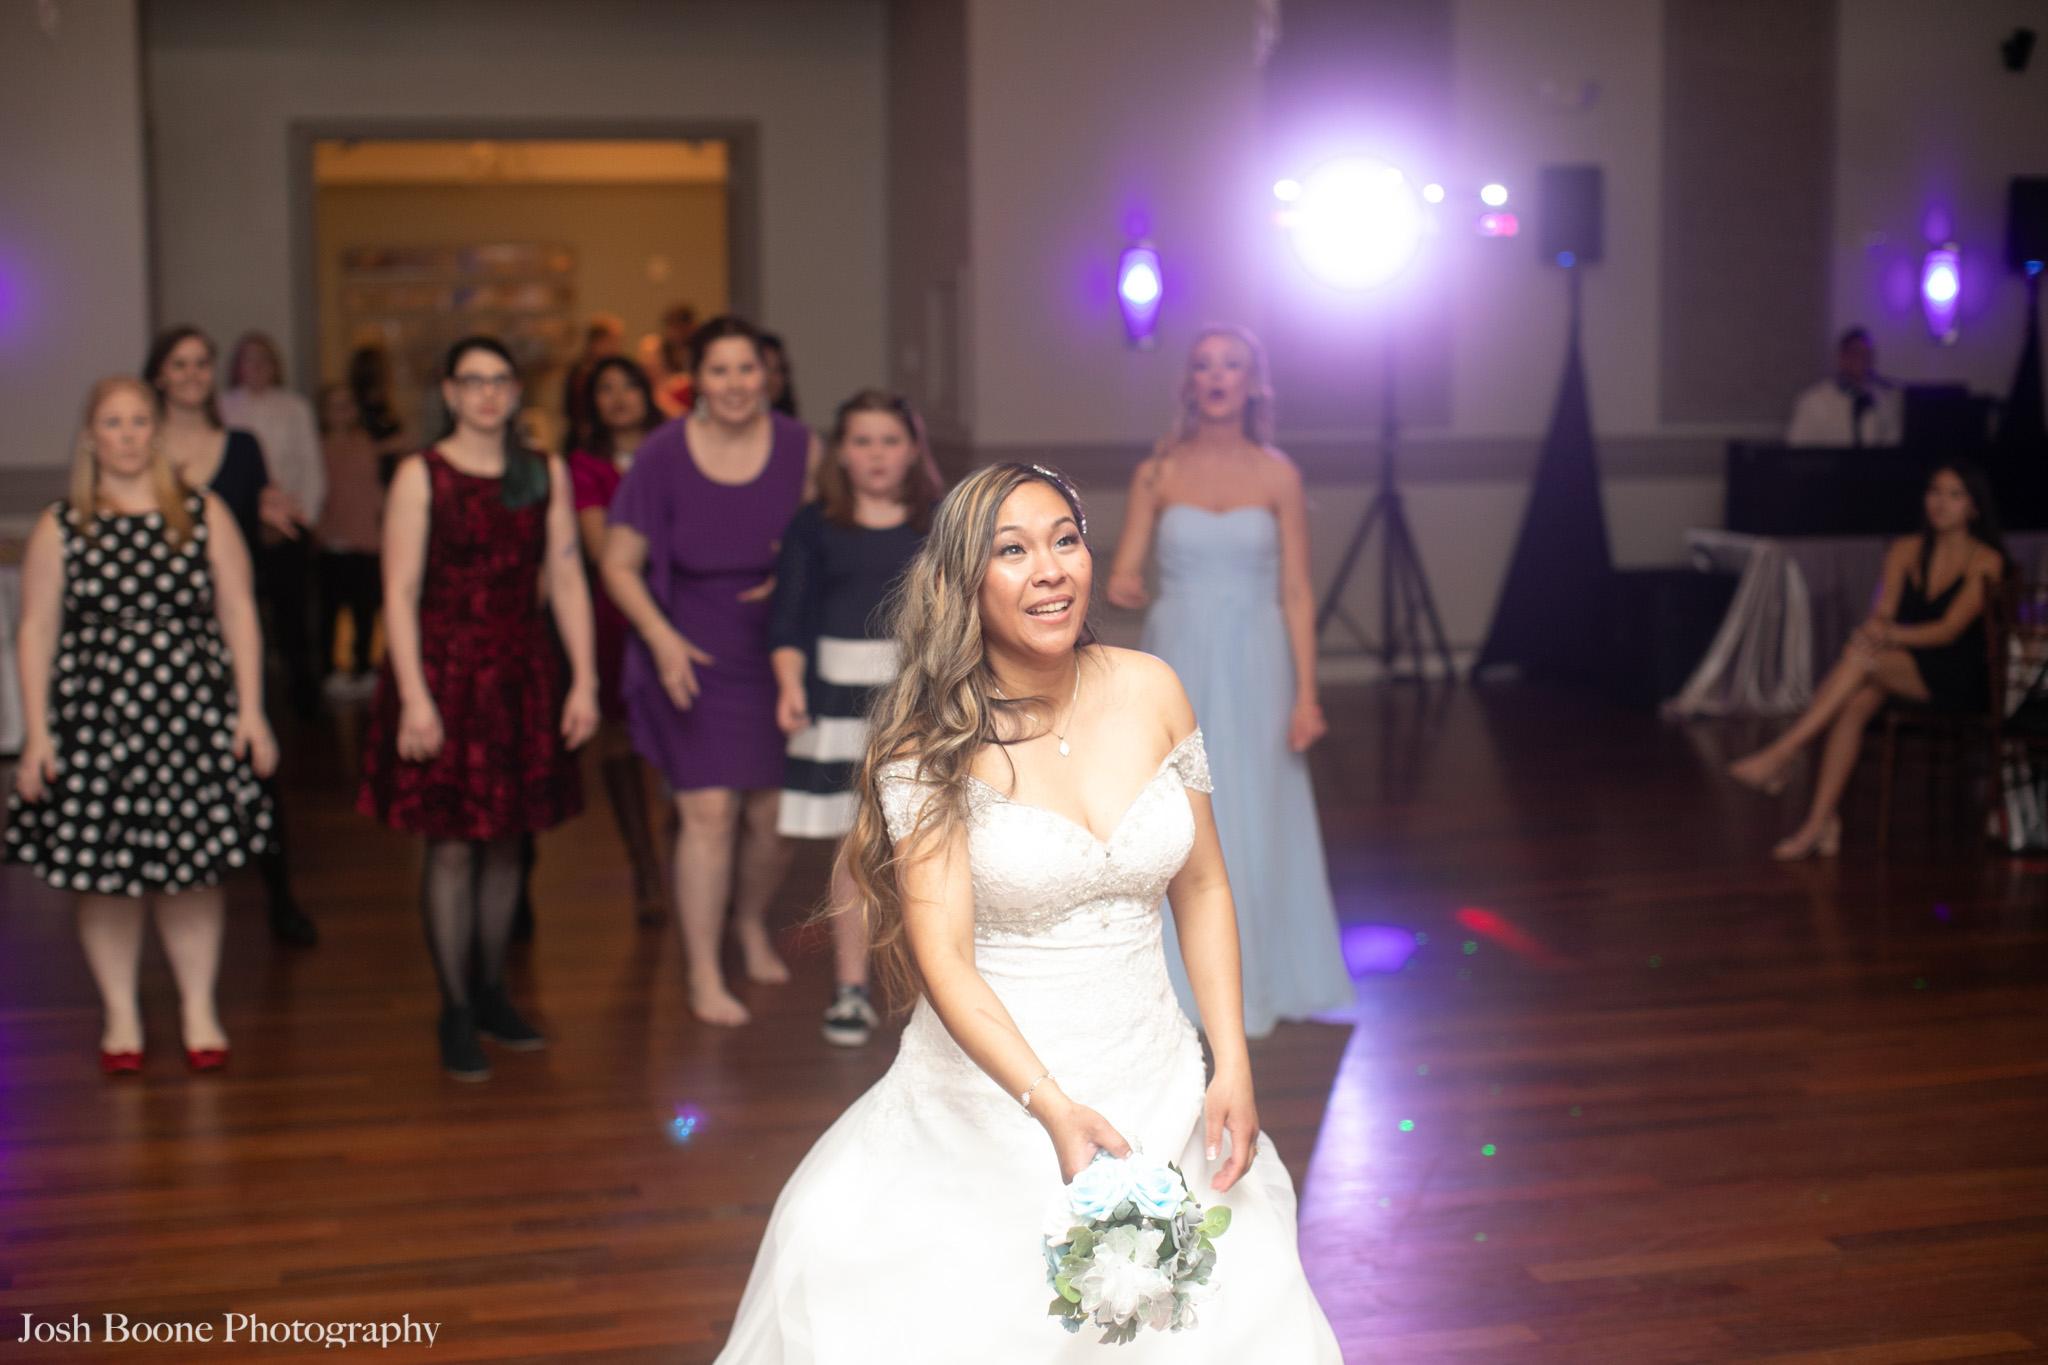 noahs_event_venue_wedding-87.jpg